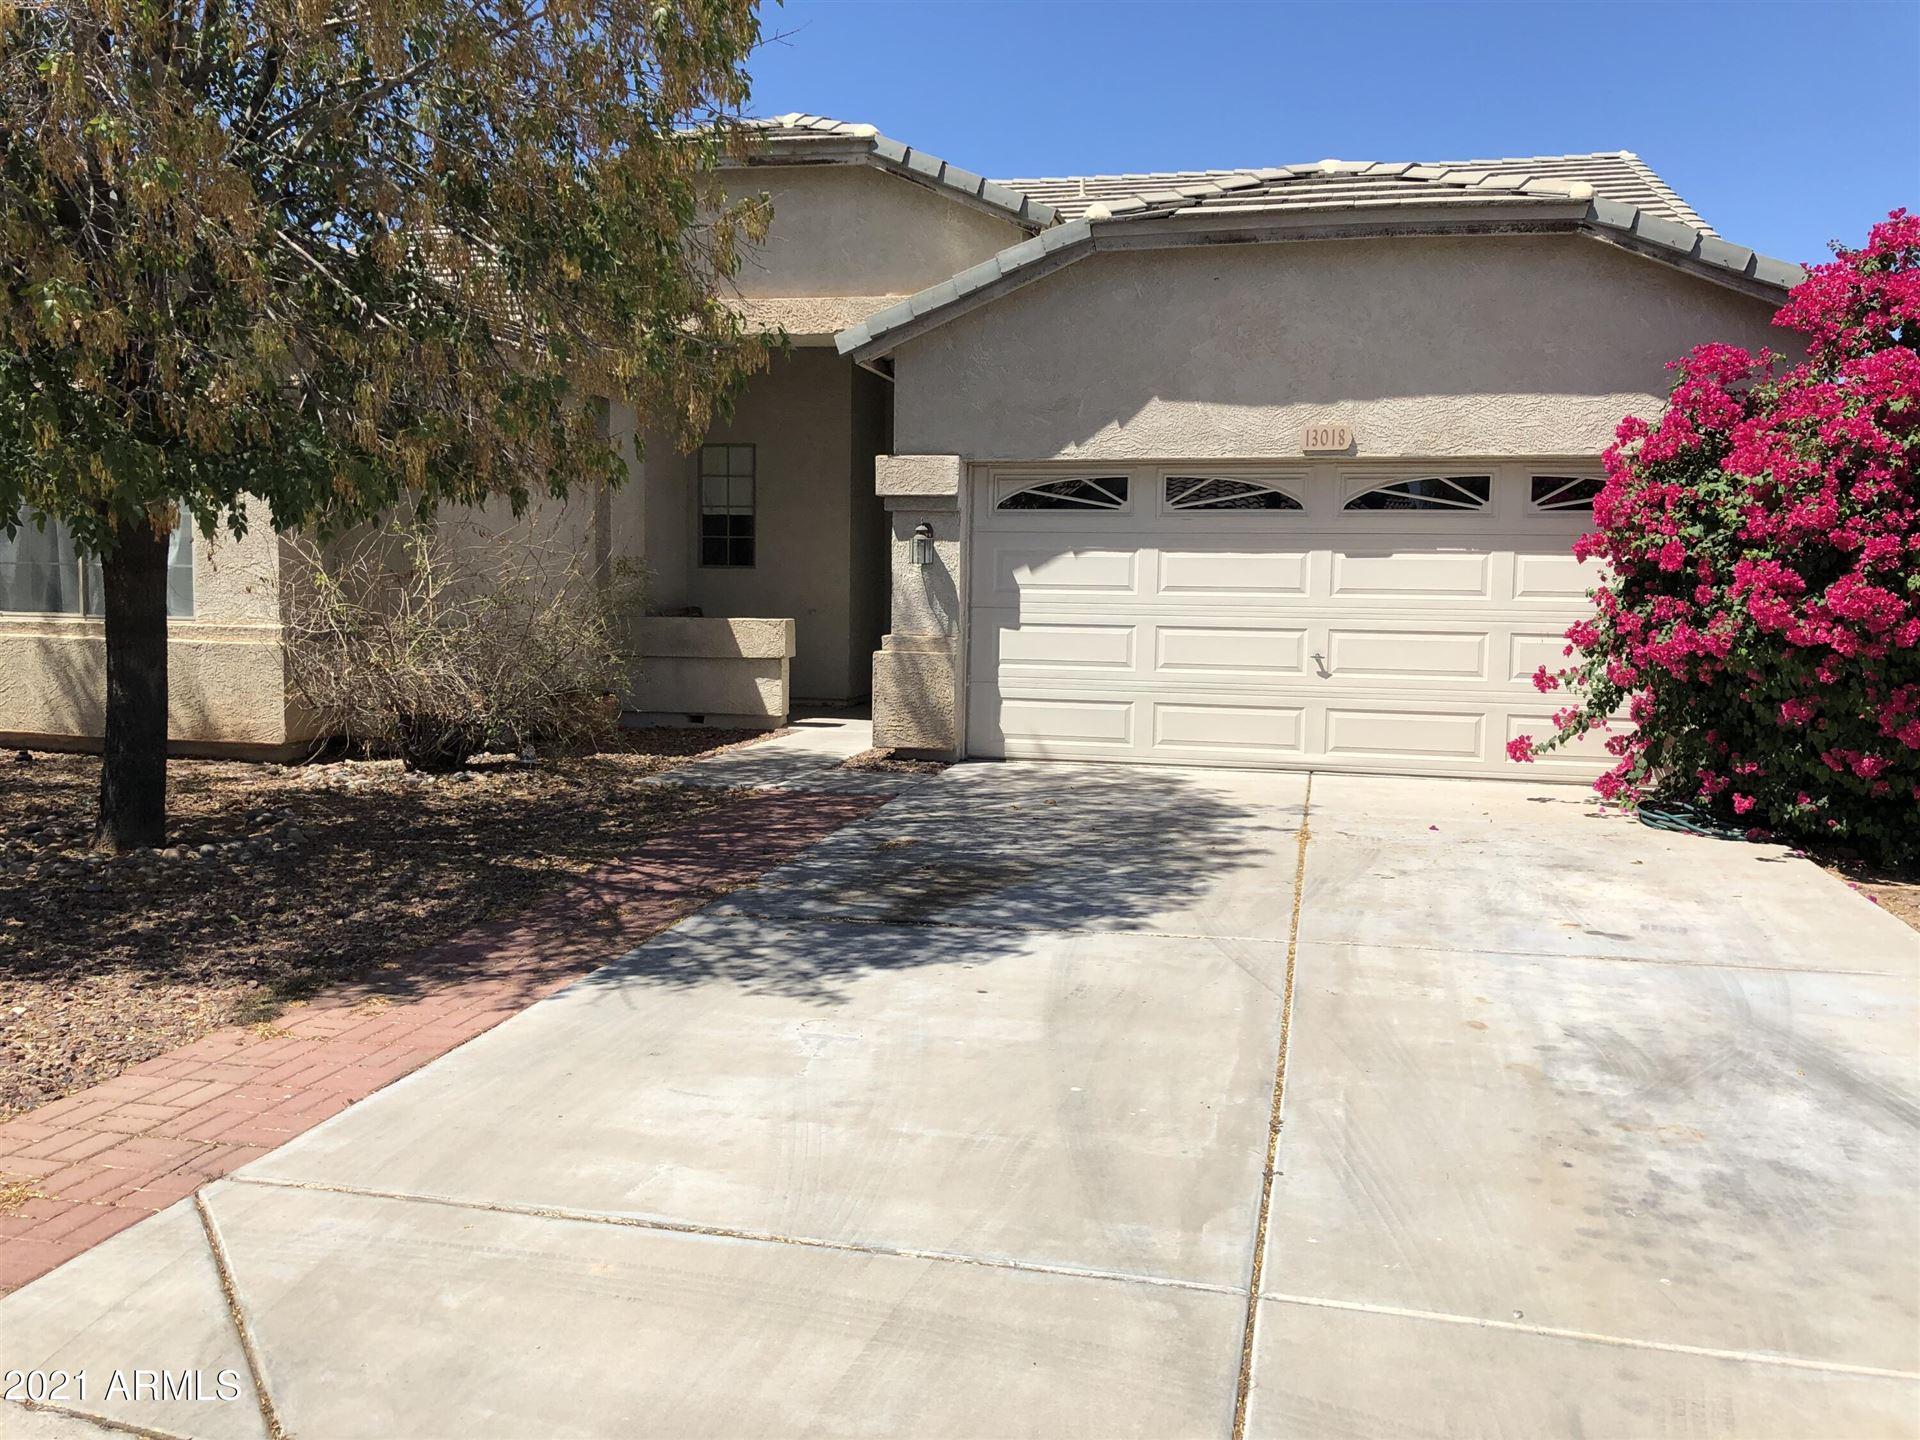 Photo of 13018 W PERSHING Street, El Mirage, AZ 85335 (MLS # 6243947)